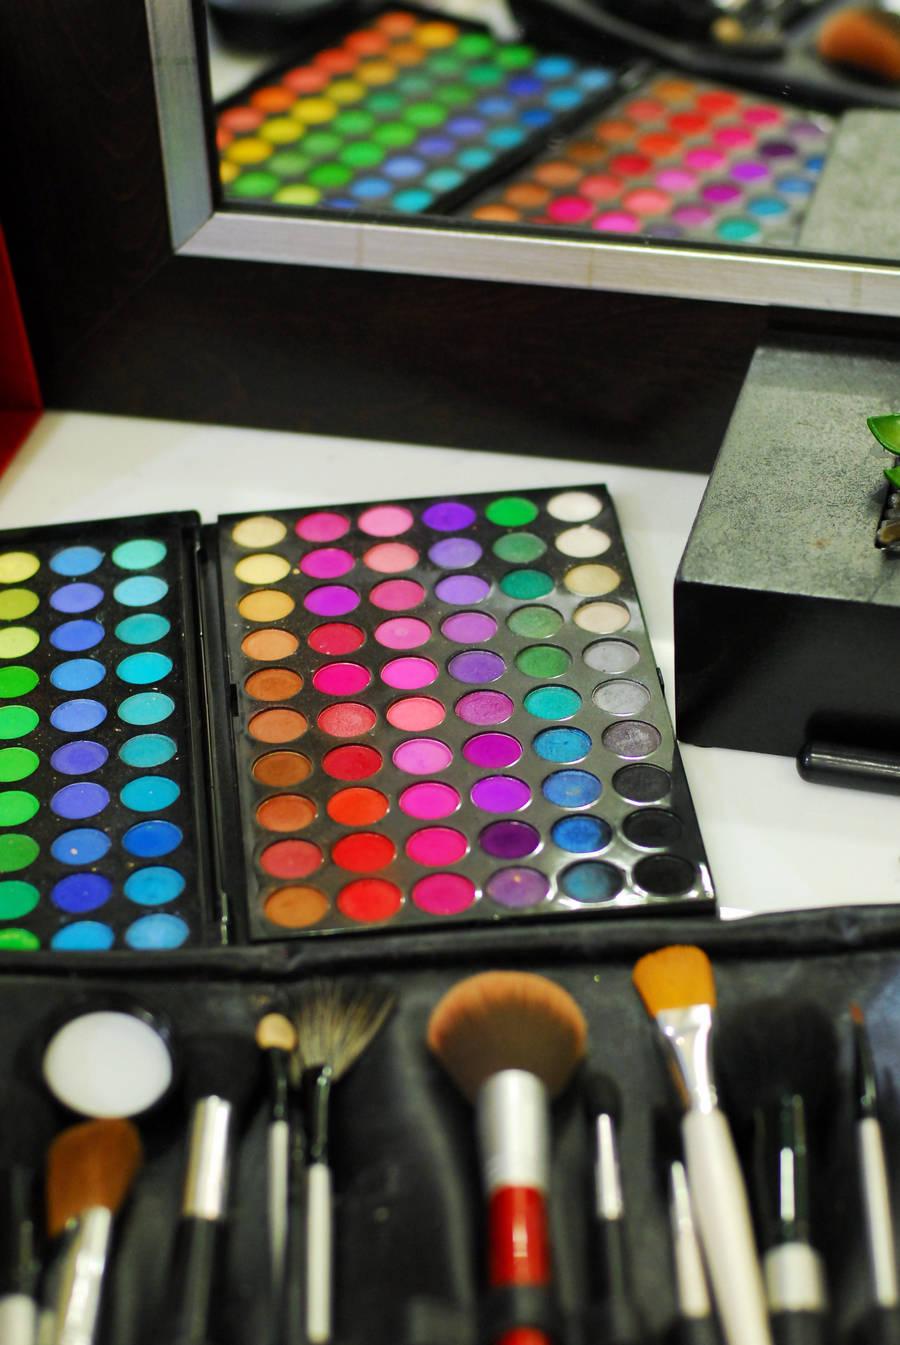 Annette's Color Pallet by Bonedaddybruce